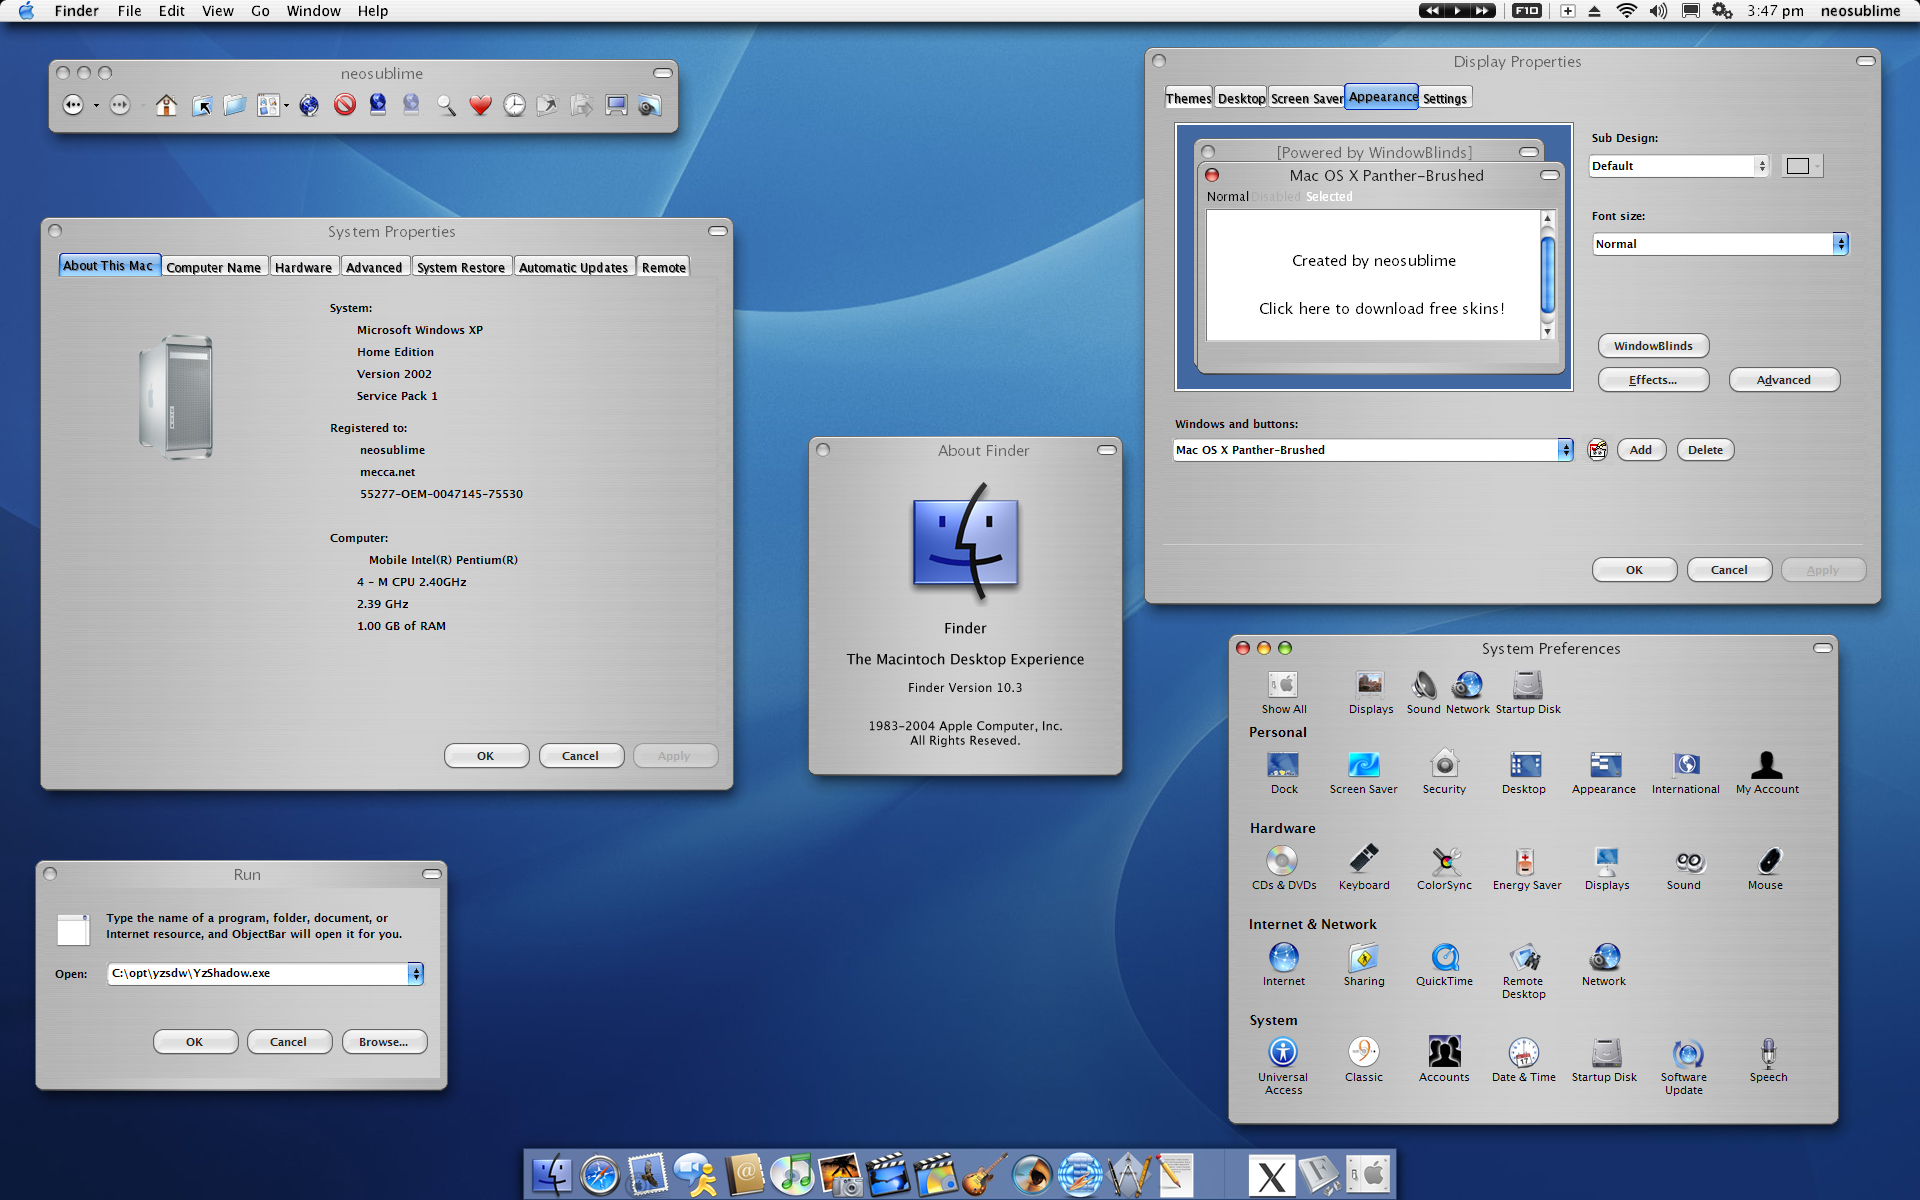 Mac OS X Panther-Brushed